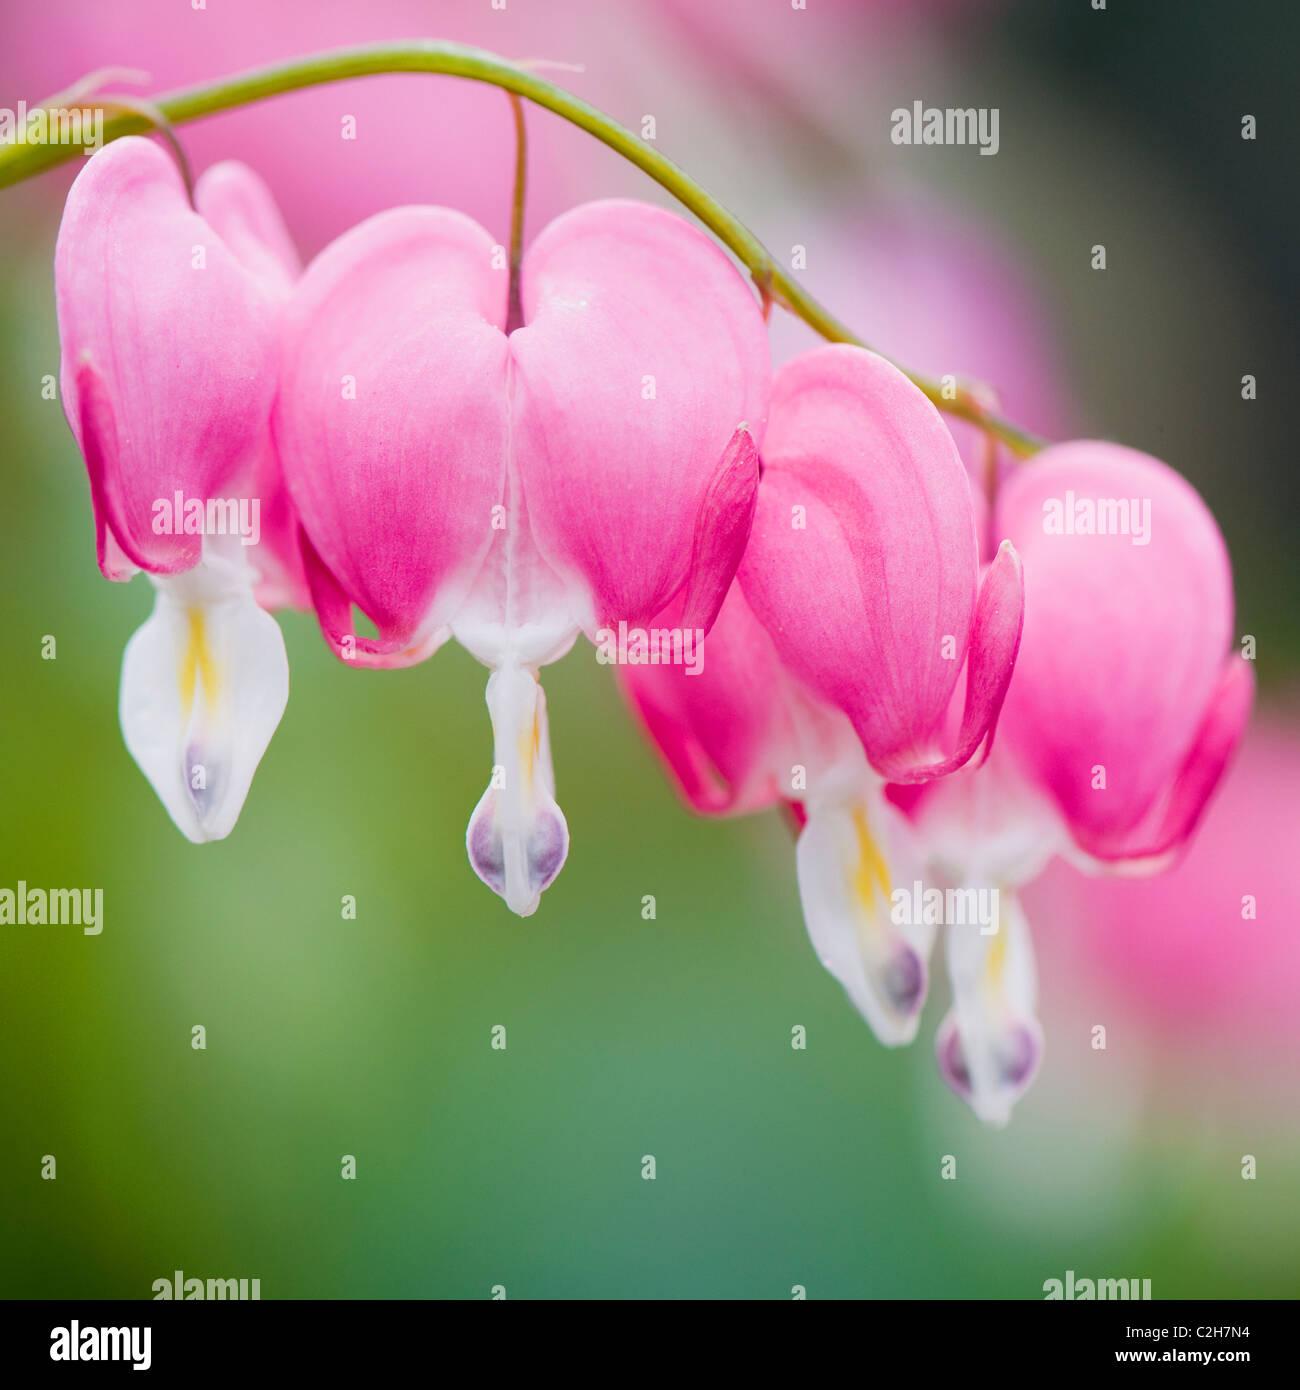 Lamprocapnos spectabilis, Dicentra Spectabilis -  Bleeding Heart, Loves Lies Bleeding pink flowers - Stock Image